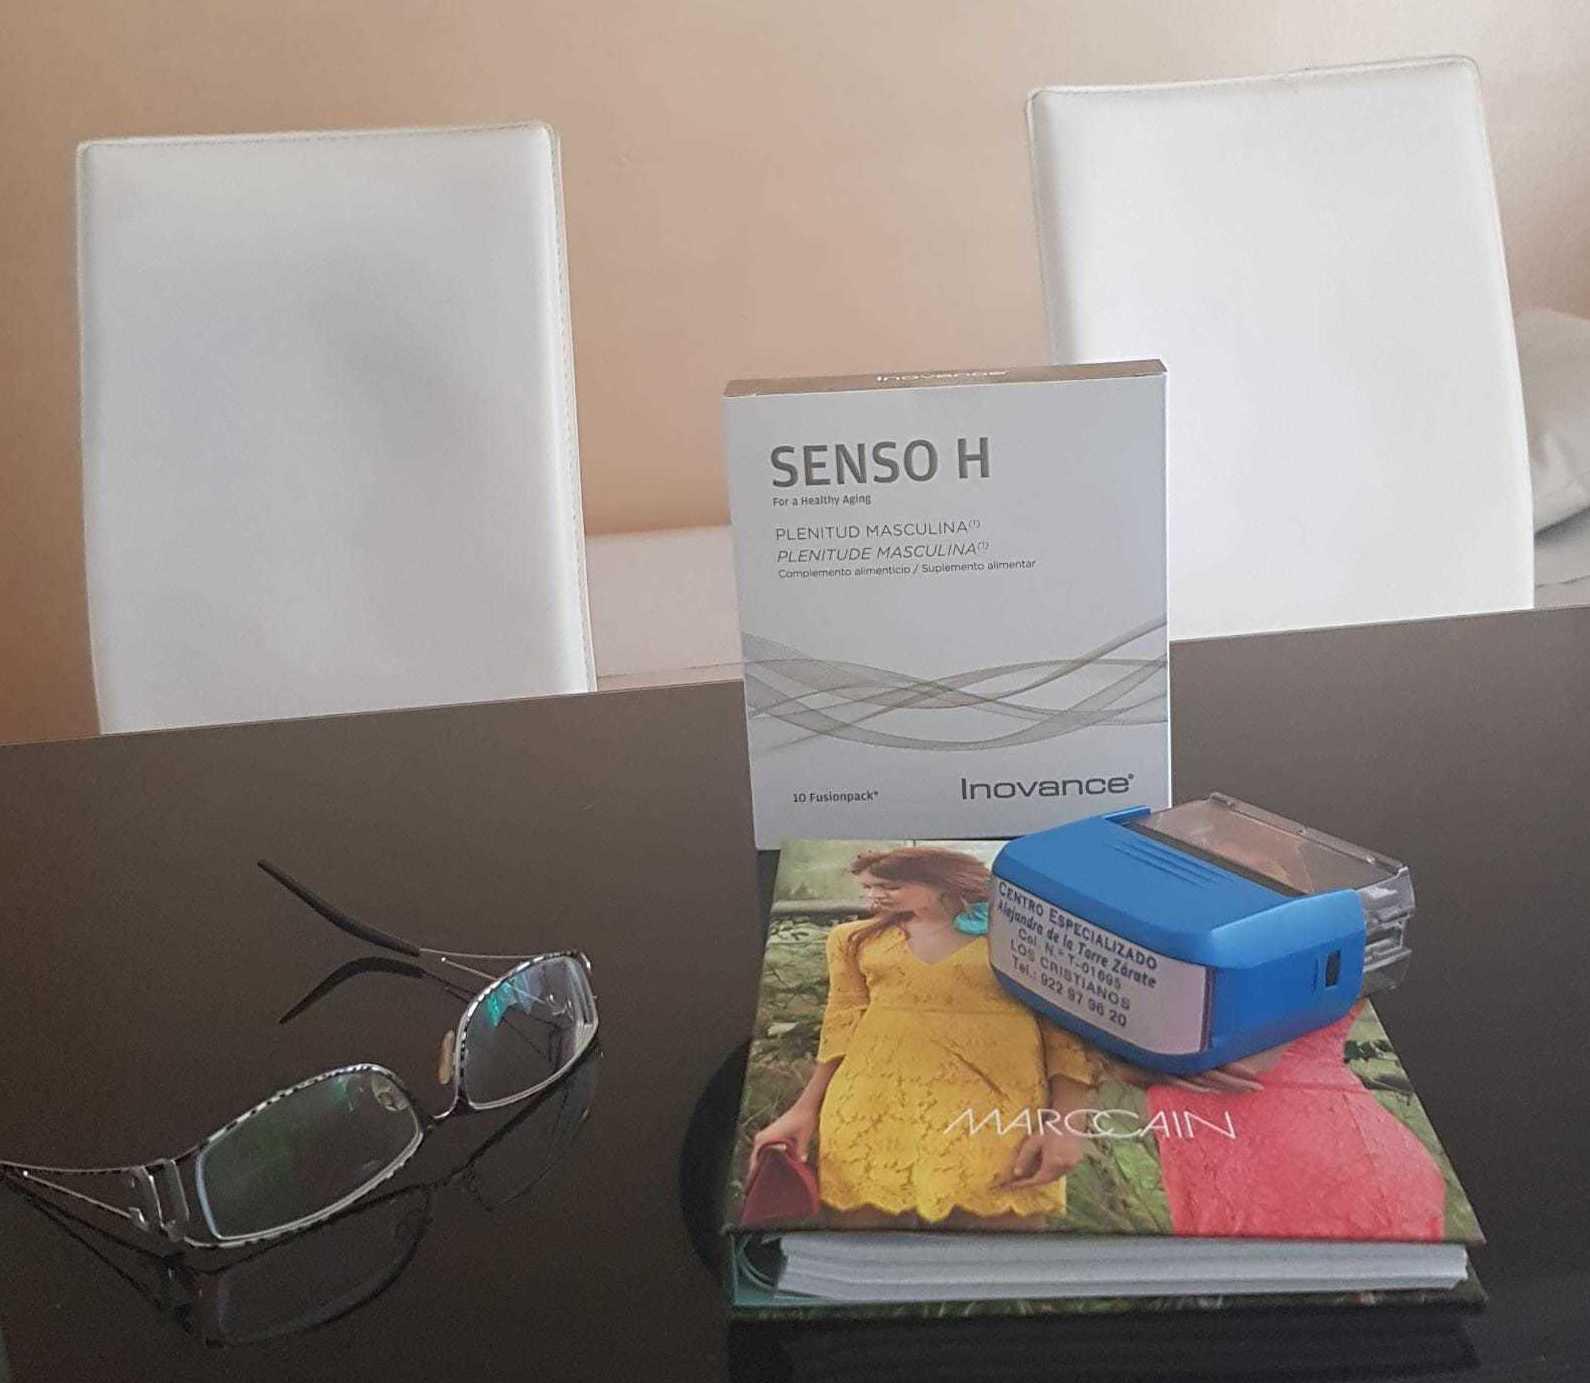 SENSO H. Plenitud masculina